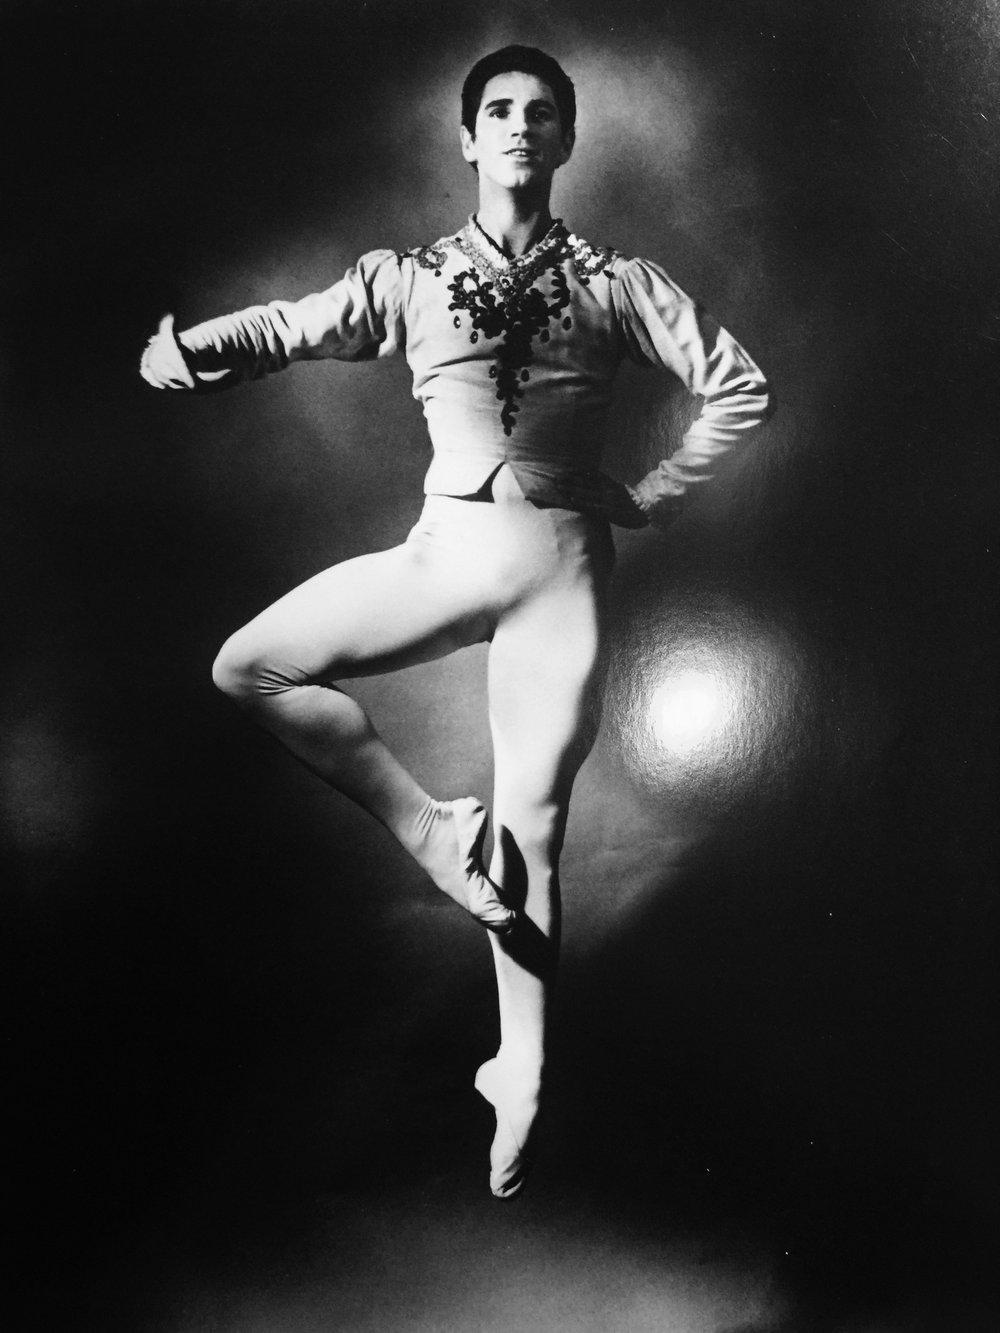 Ted Kivitt | American Ballet Theatre